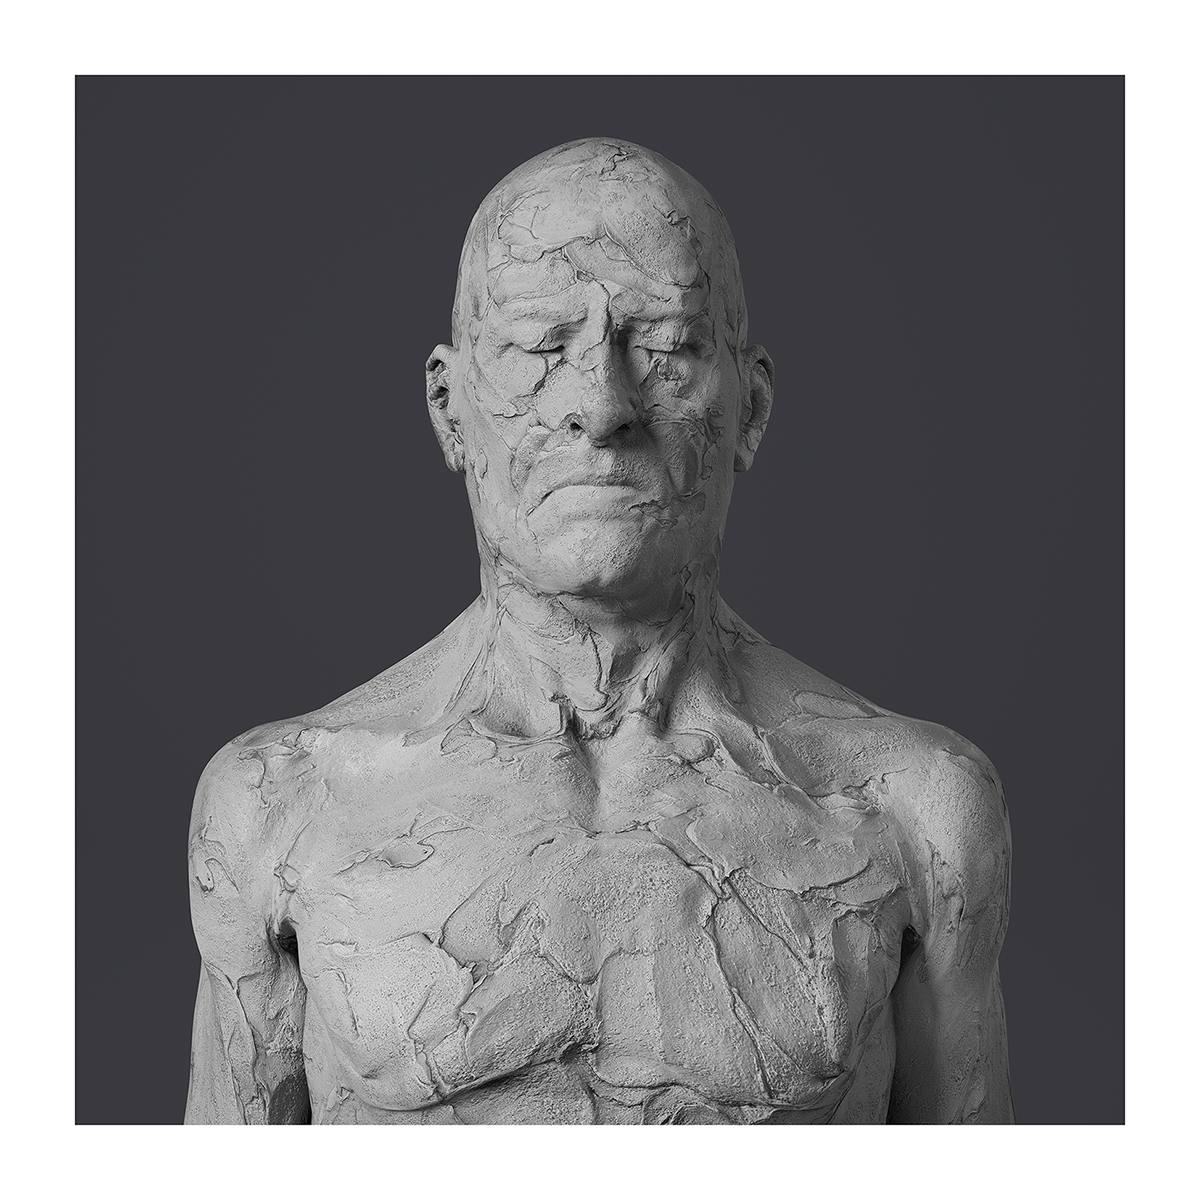 190 Virtual Portraits The couple RCC Busts 001 1 - 2021 - Virtual Portraits. (The couple - Realistic Chunky Clay Busts)